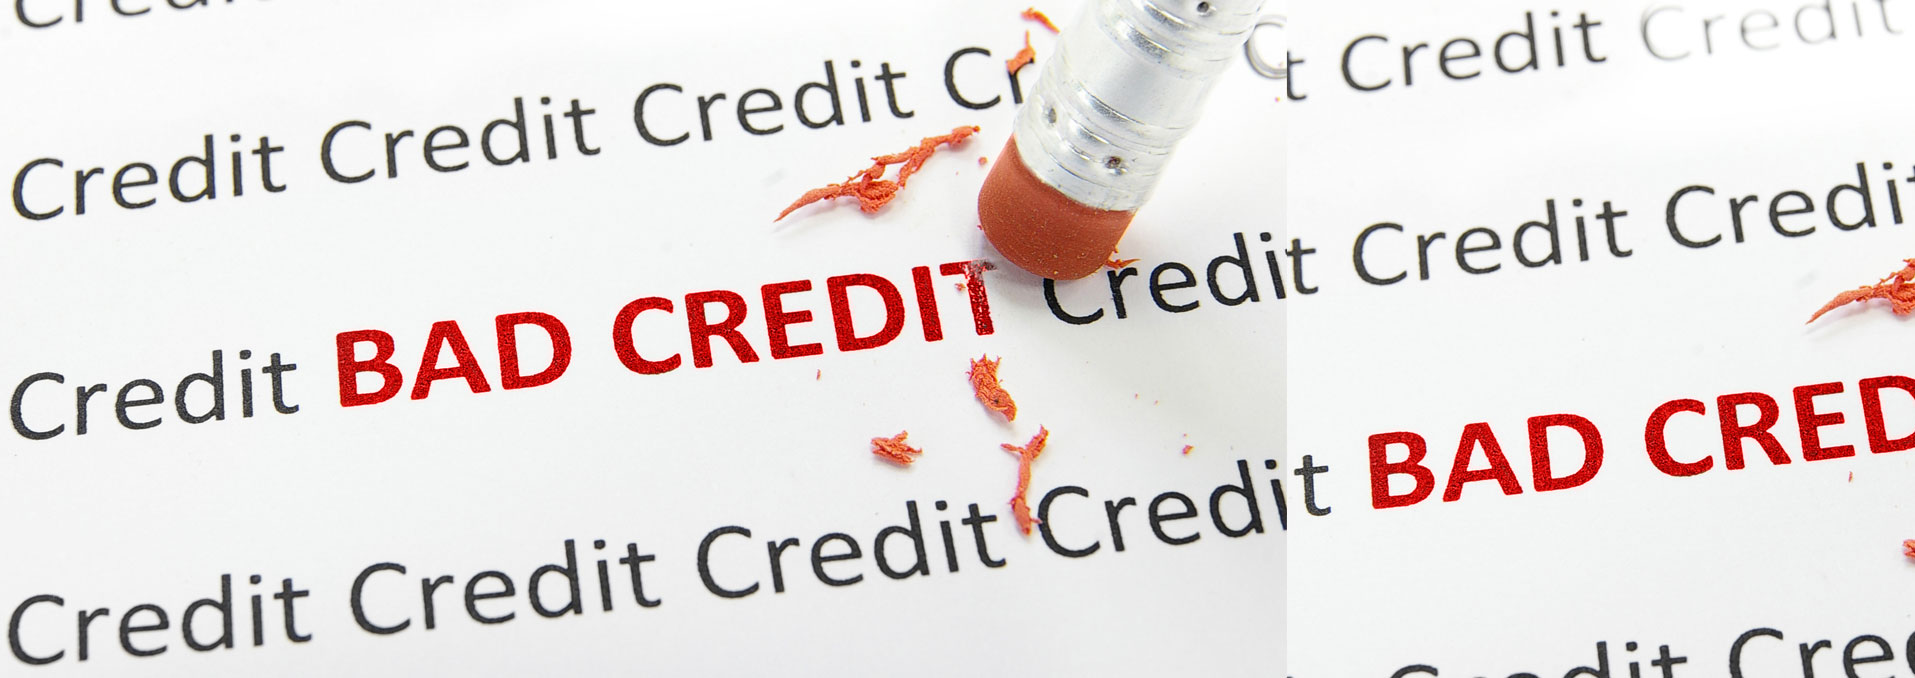 Mortgage Refinancing Bad Credit | Toronto Mortgage Broker - Rumy Gill